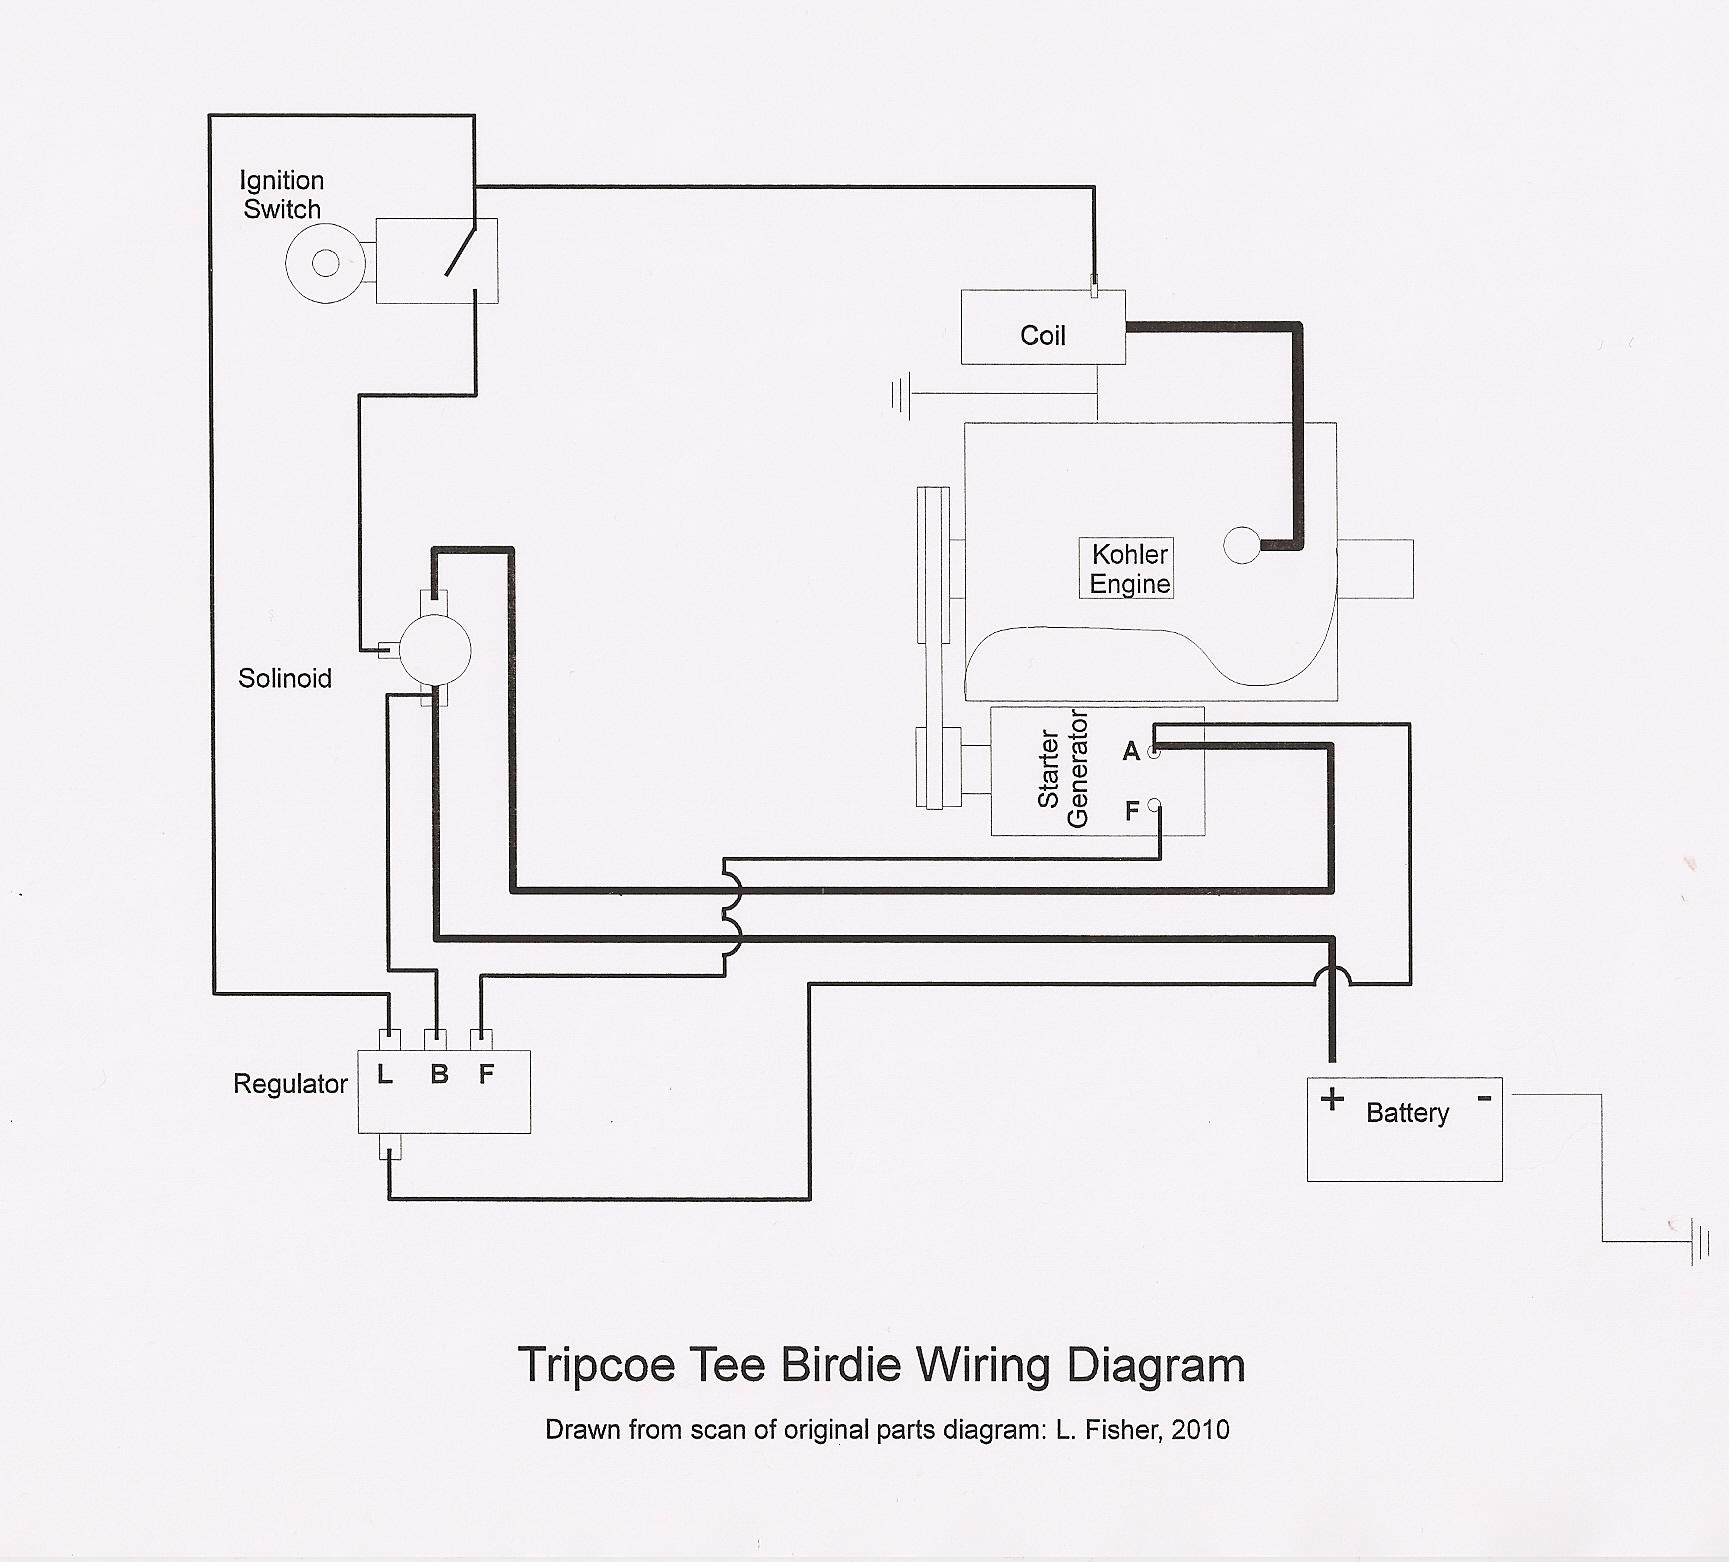 36 volt ezgo battery wiring diagram 36 volt ezgo wiring diagram 1986 e1 wiring diagram  36 volt ezgo wiring diagram 1986 e1